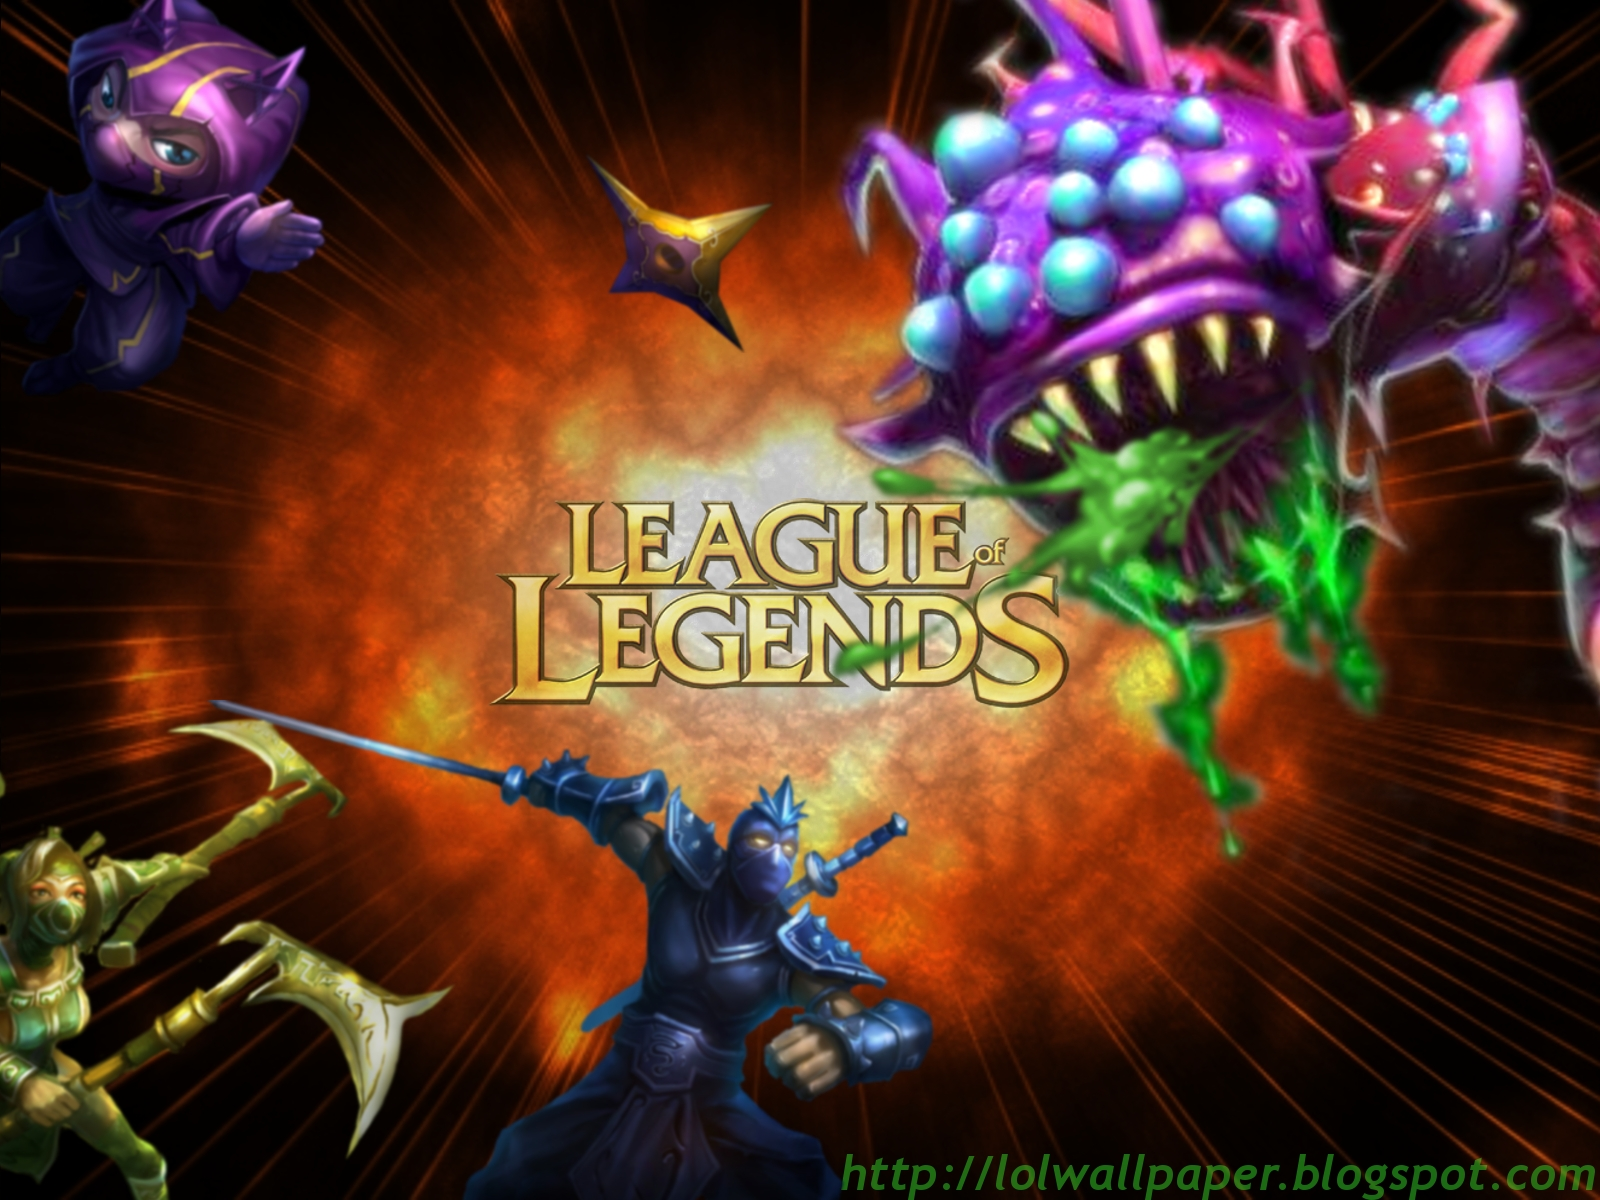 Wallpaper Olaf League Legends Download Wallpaper DaWallpaperz 1600x1200